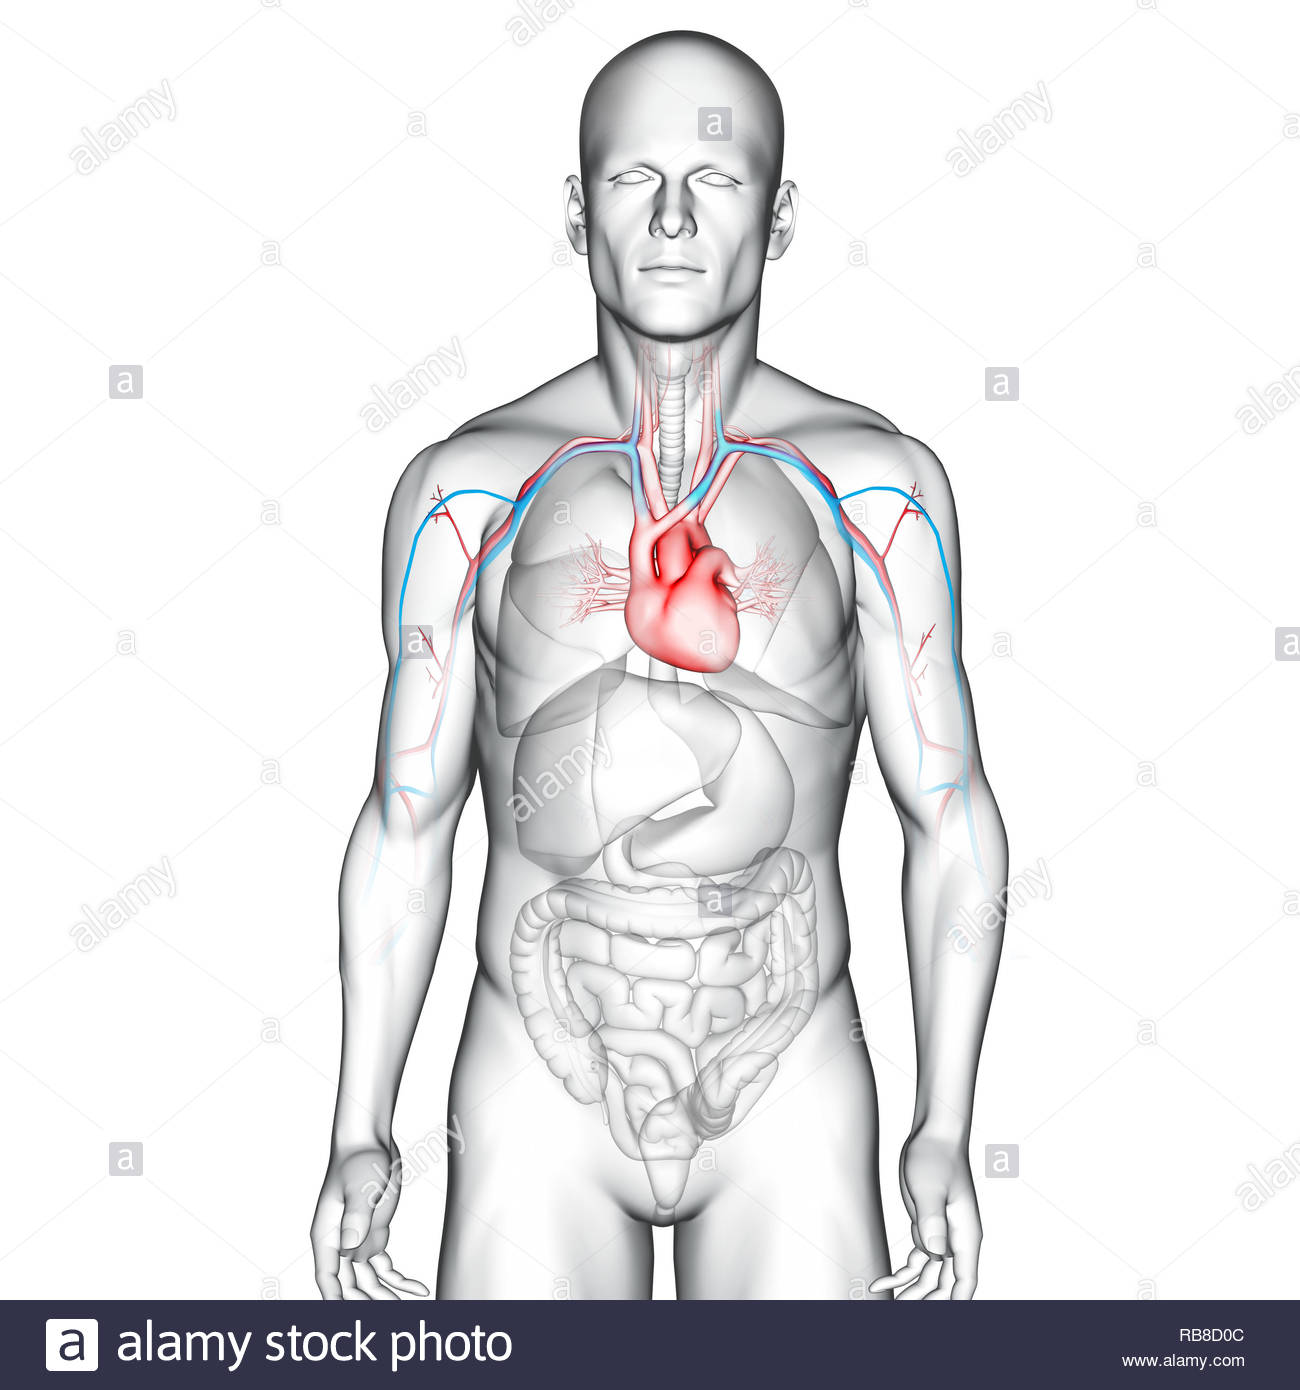 Heart - Stock Image